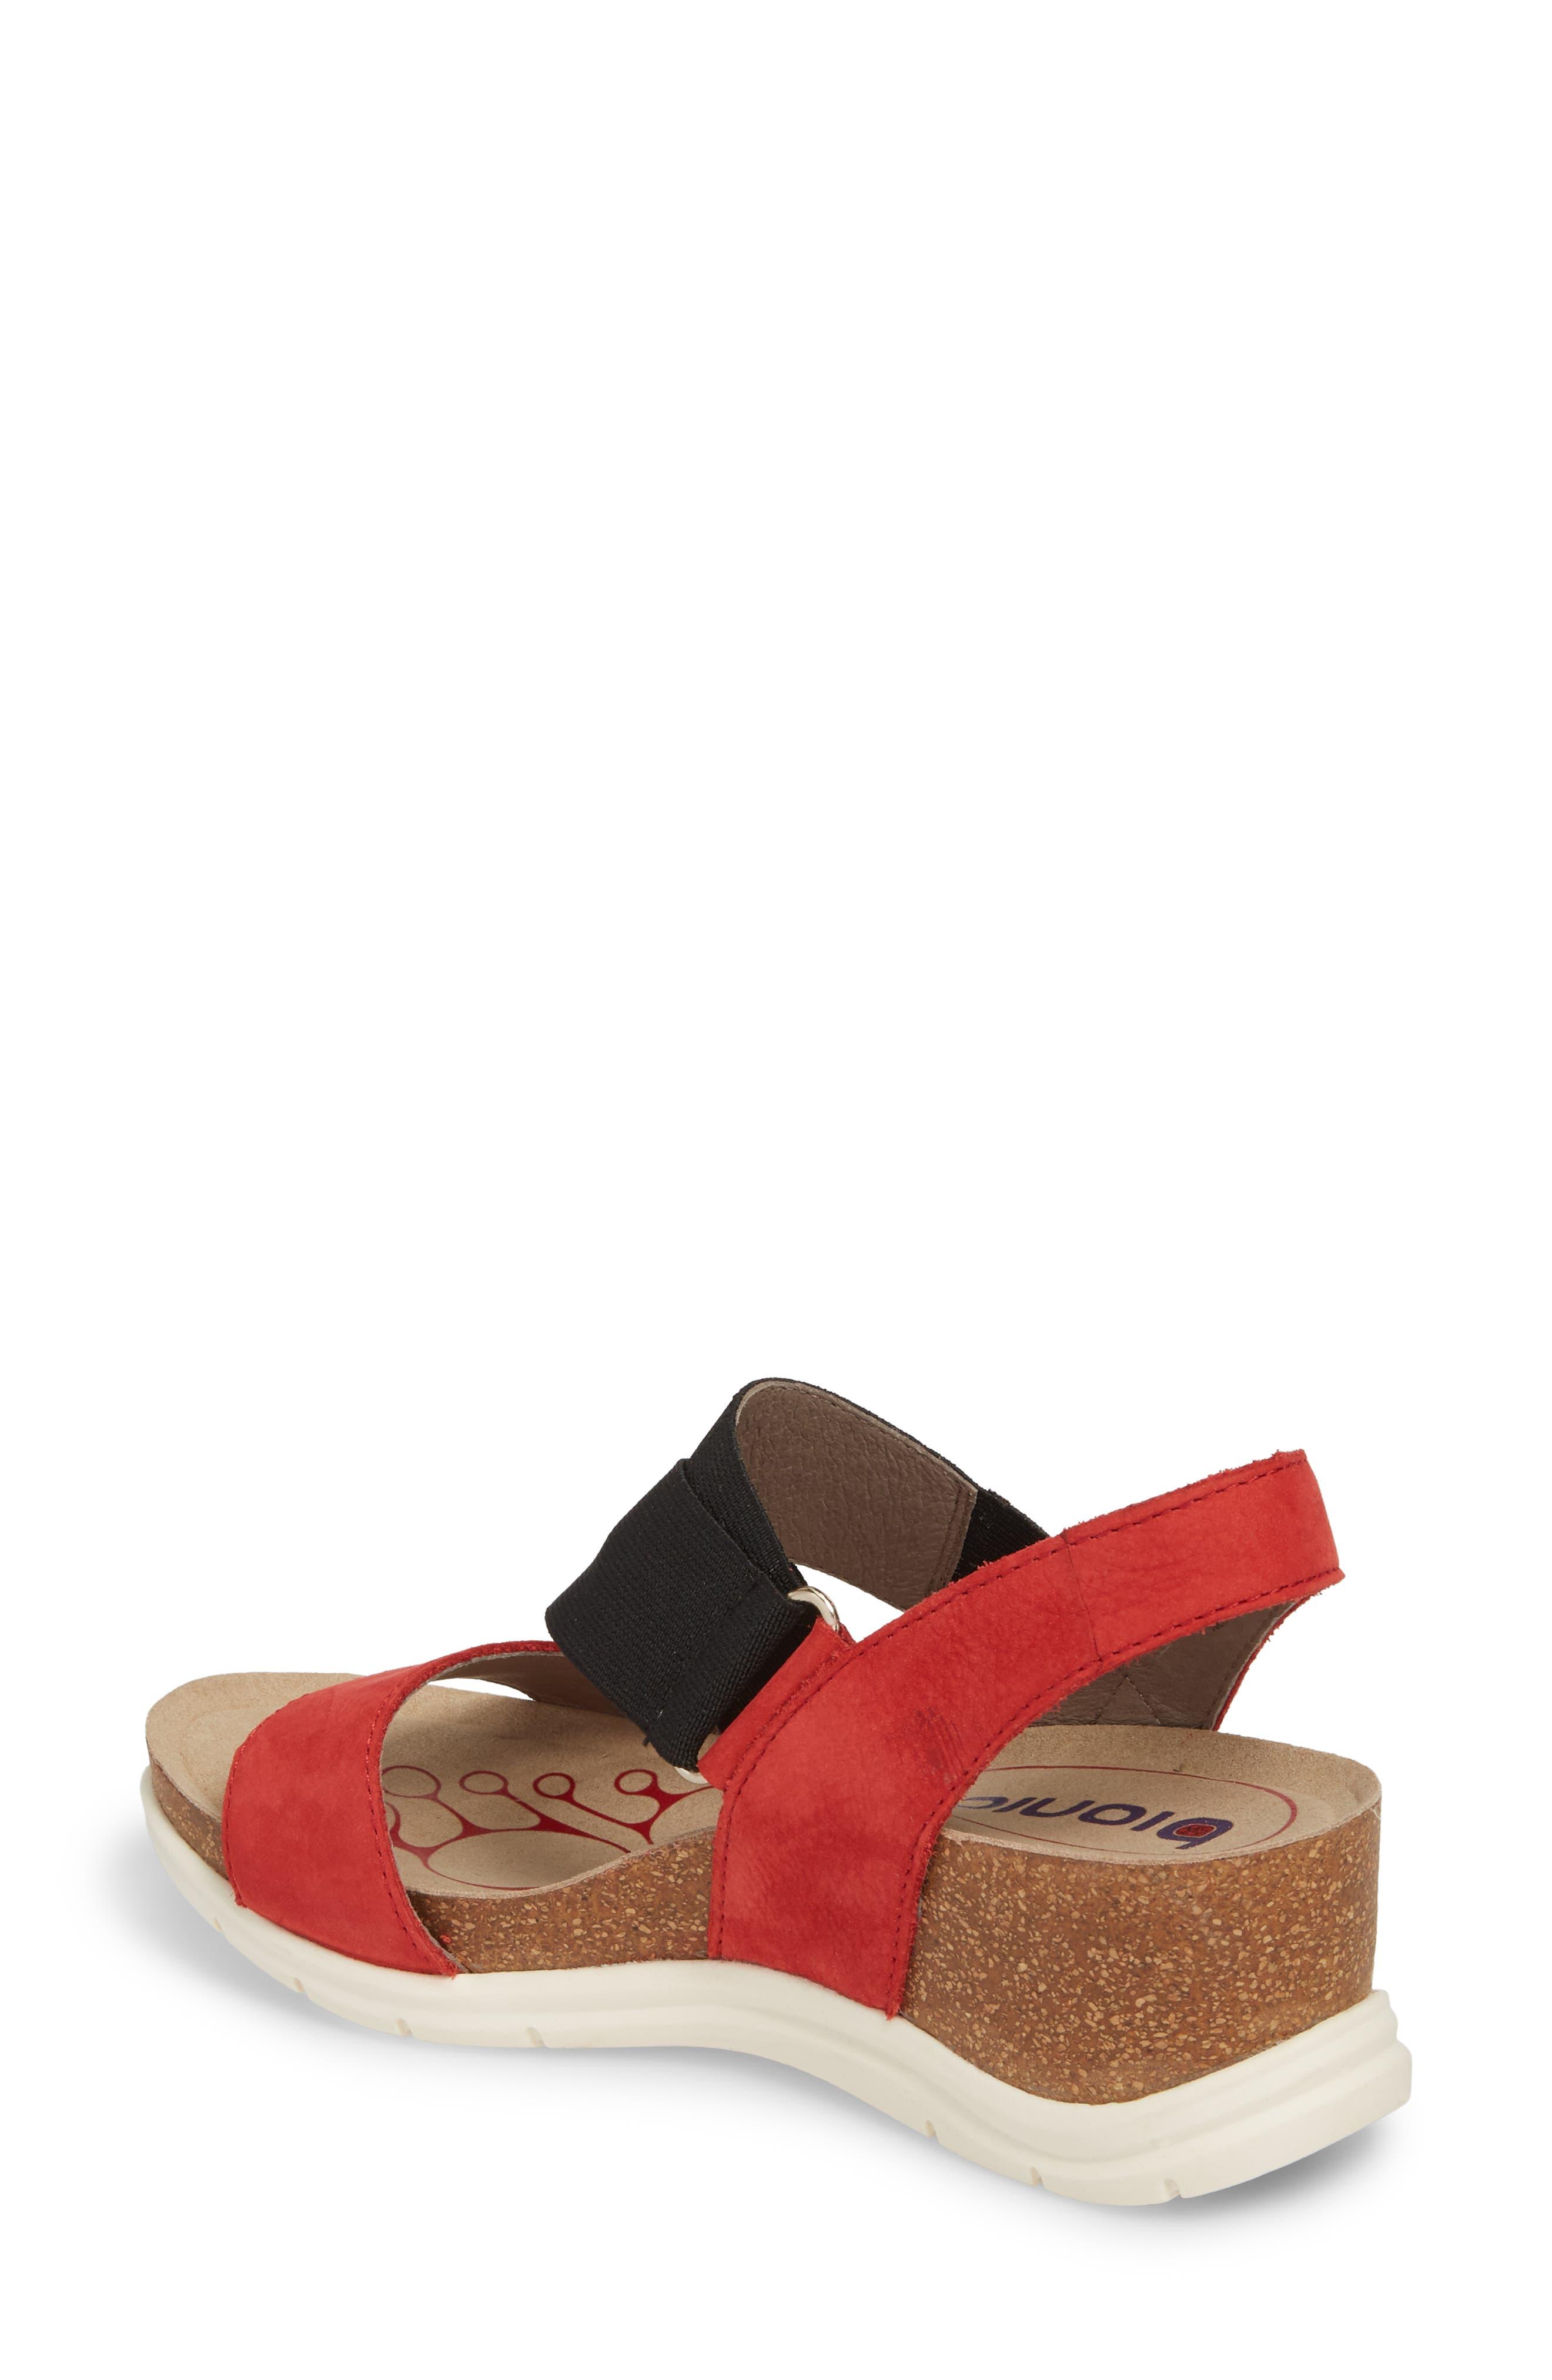 Paisley Wedge Sandal,                             Alternate thumbnail 8, color,